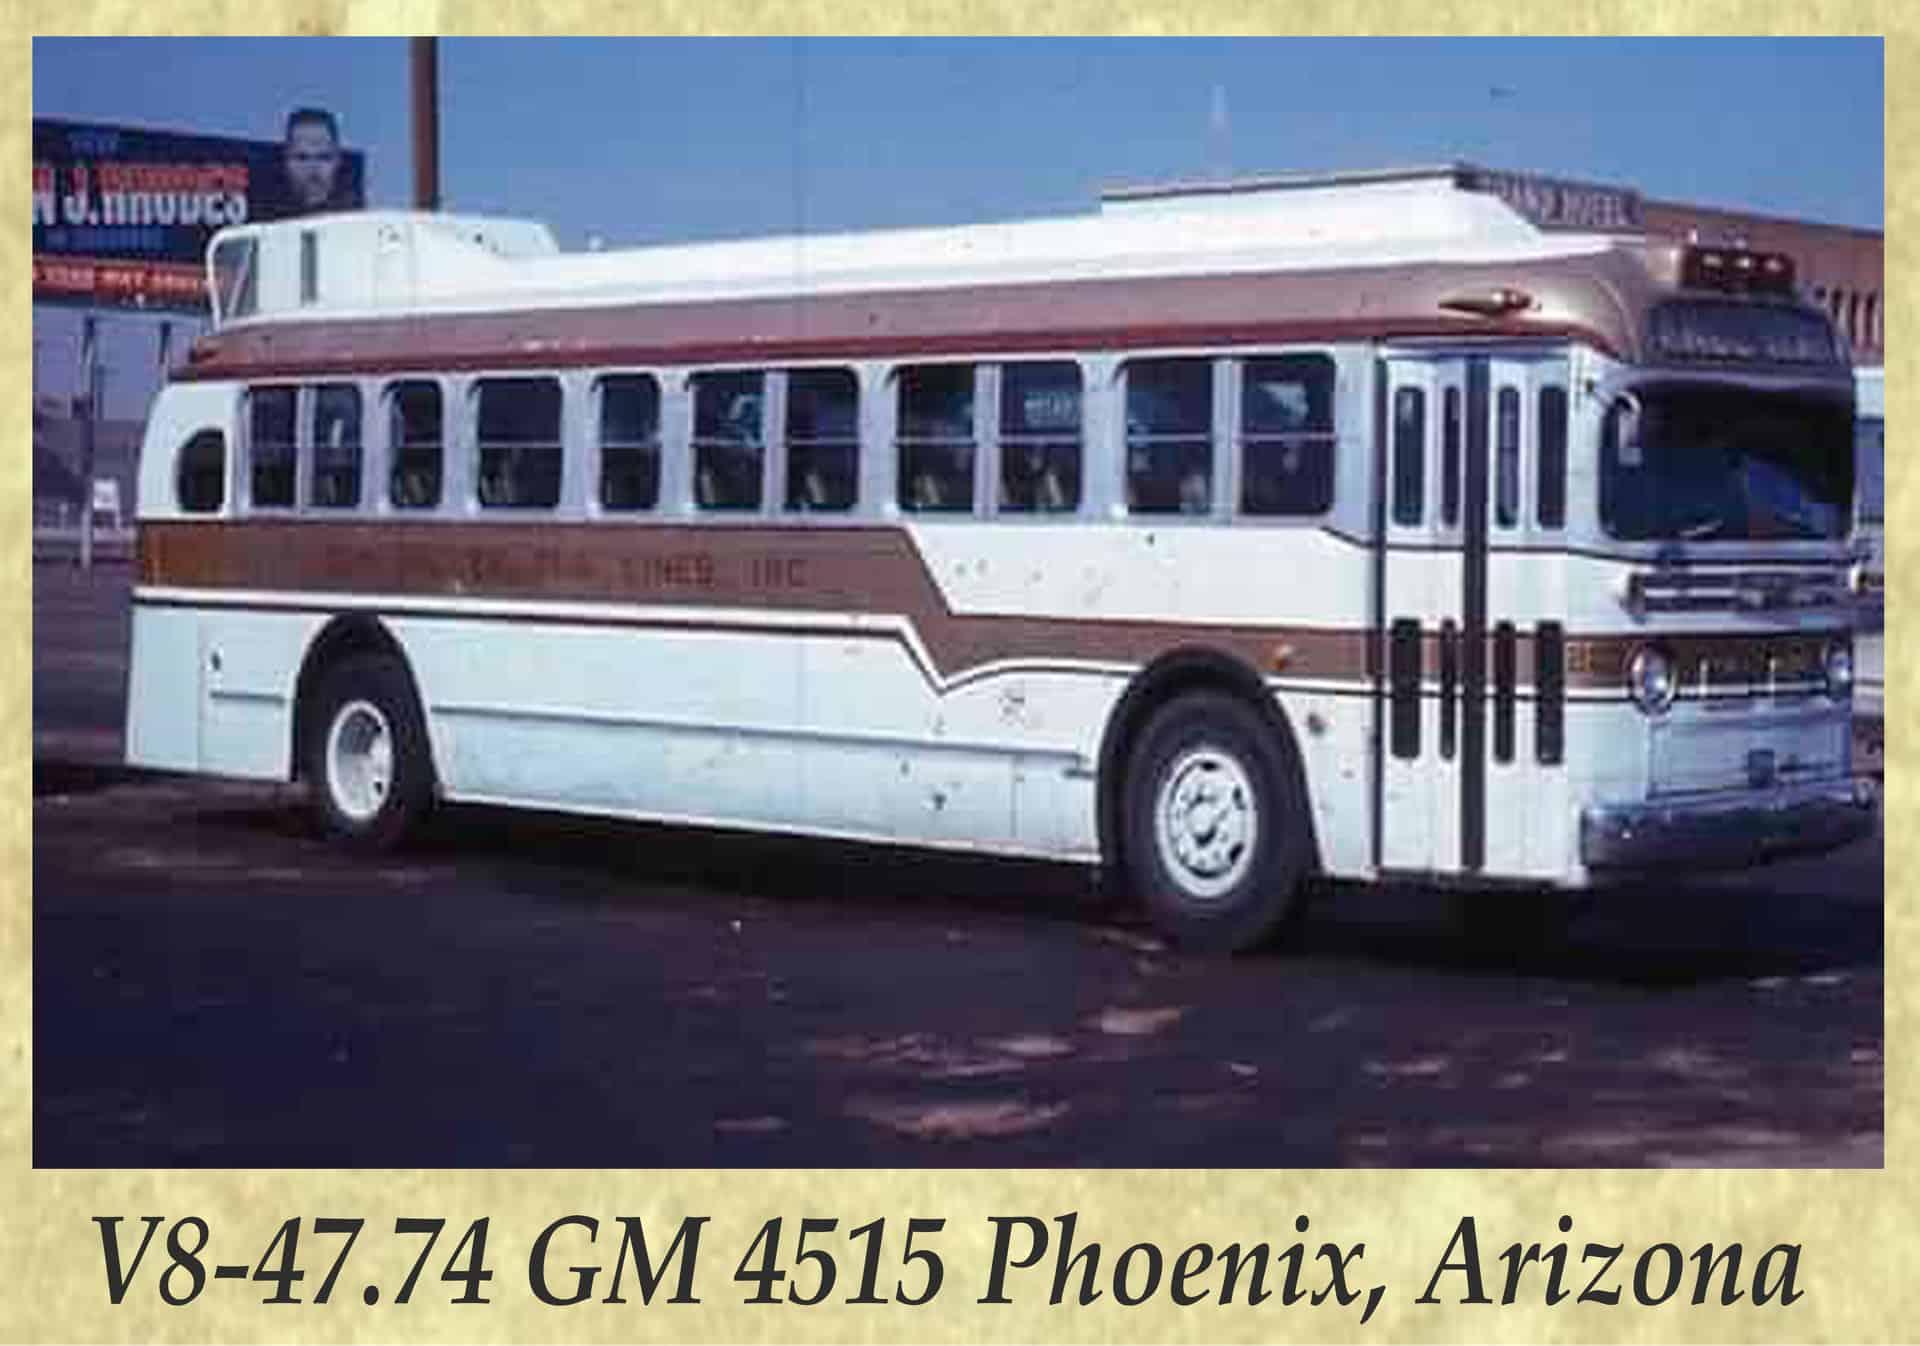 V8-47.74 GM 4515 Phoenix, Arizona